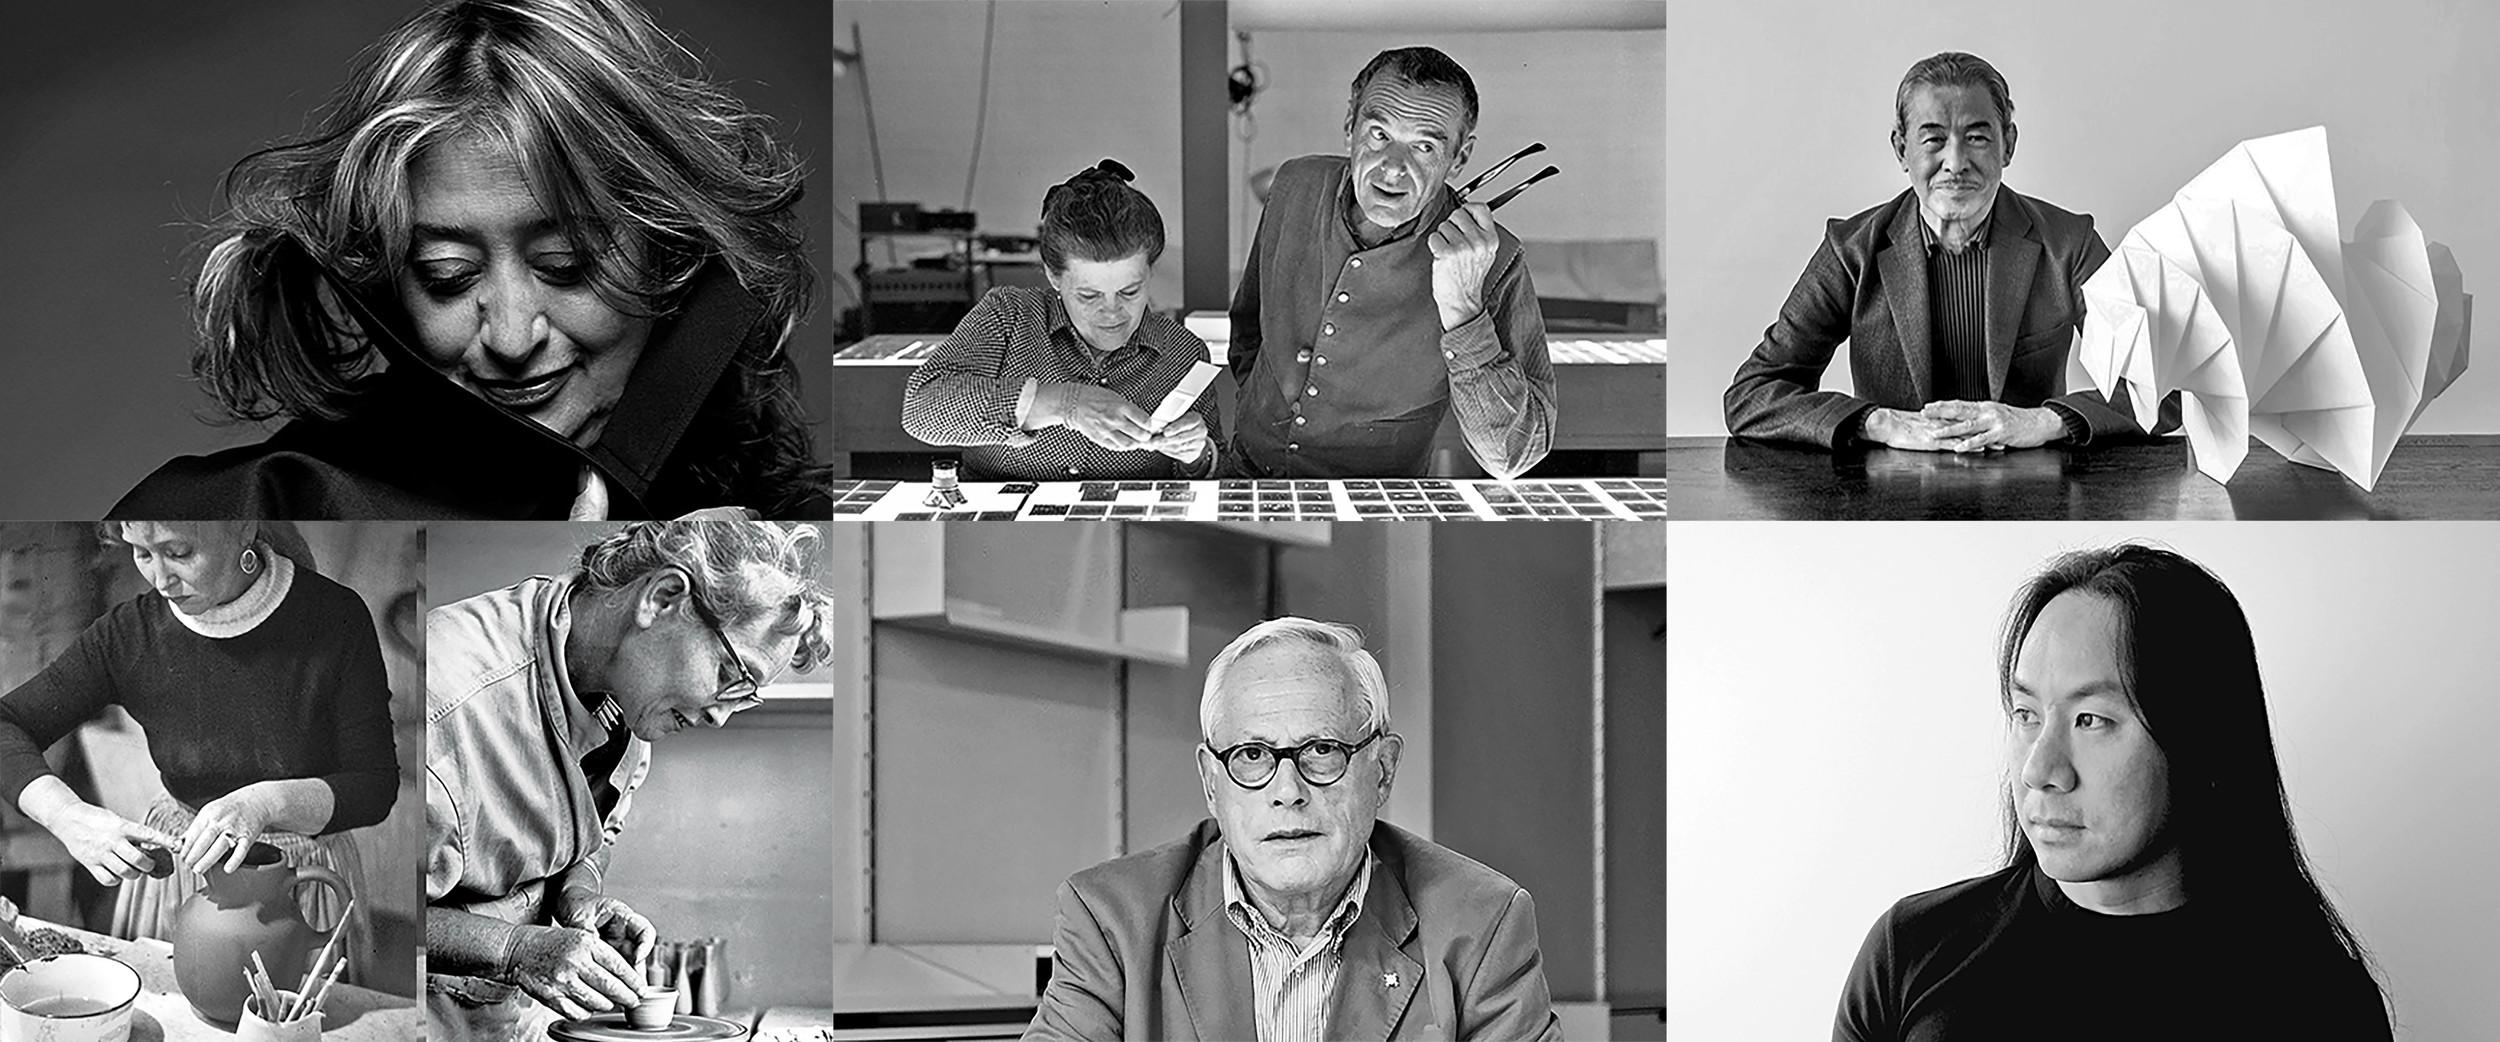 All 6 designers.jpg